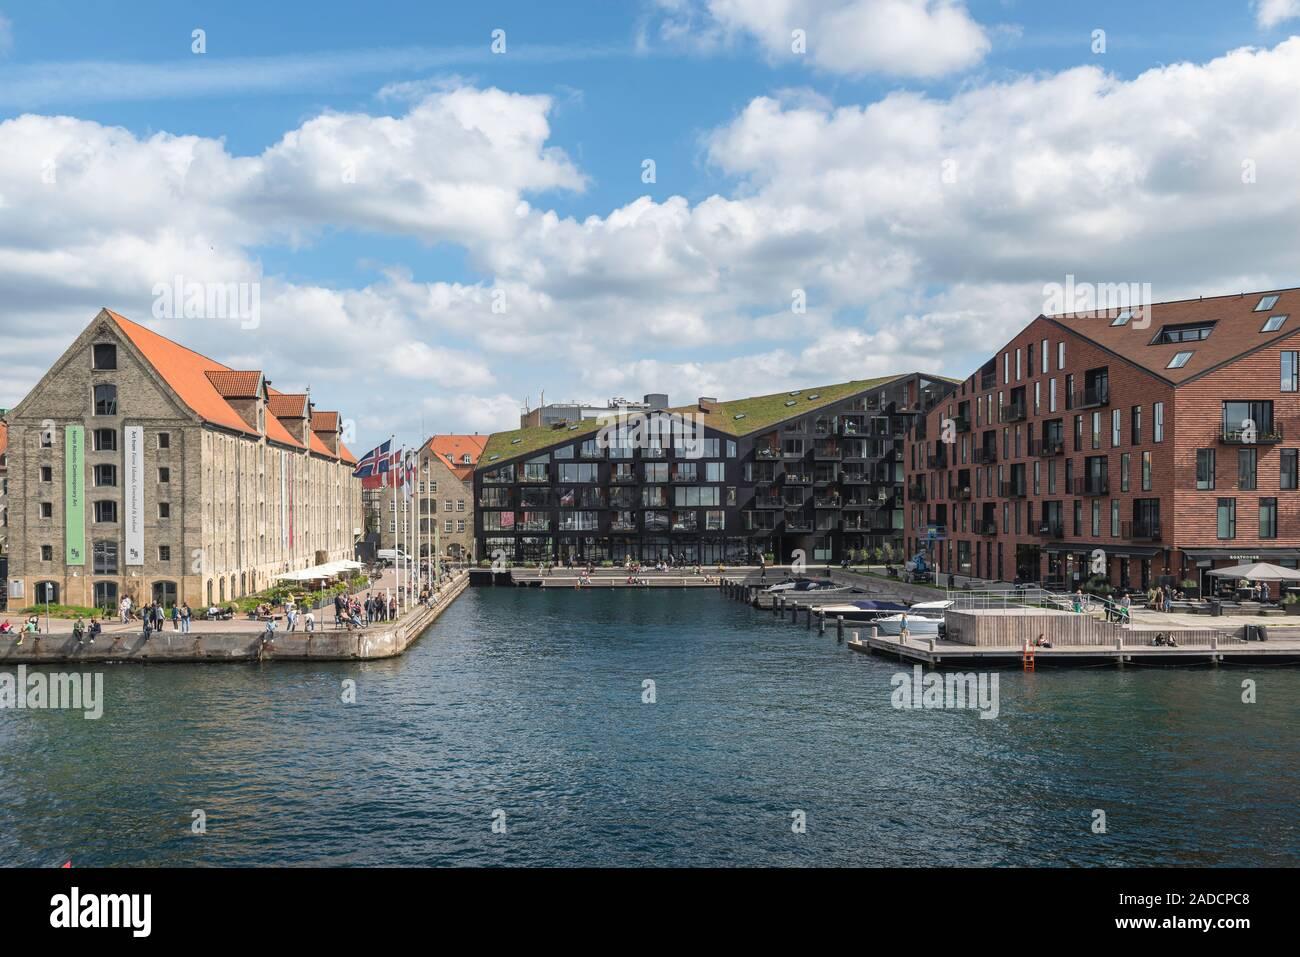 Copenhagen architecture, contrast of styles with 19th century Nordatlantens Brygge (left) and modern Krøyers Plads (right), Christianshavn, Copenhagen. Stock Photo